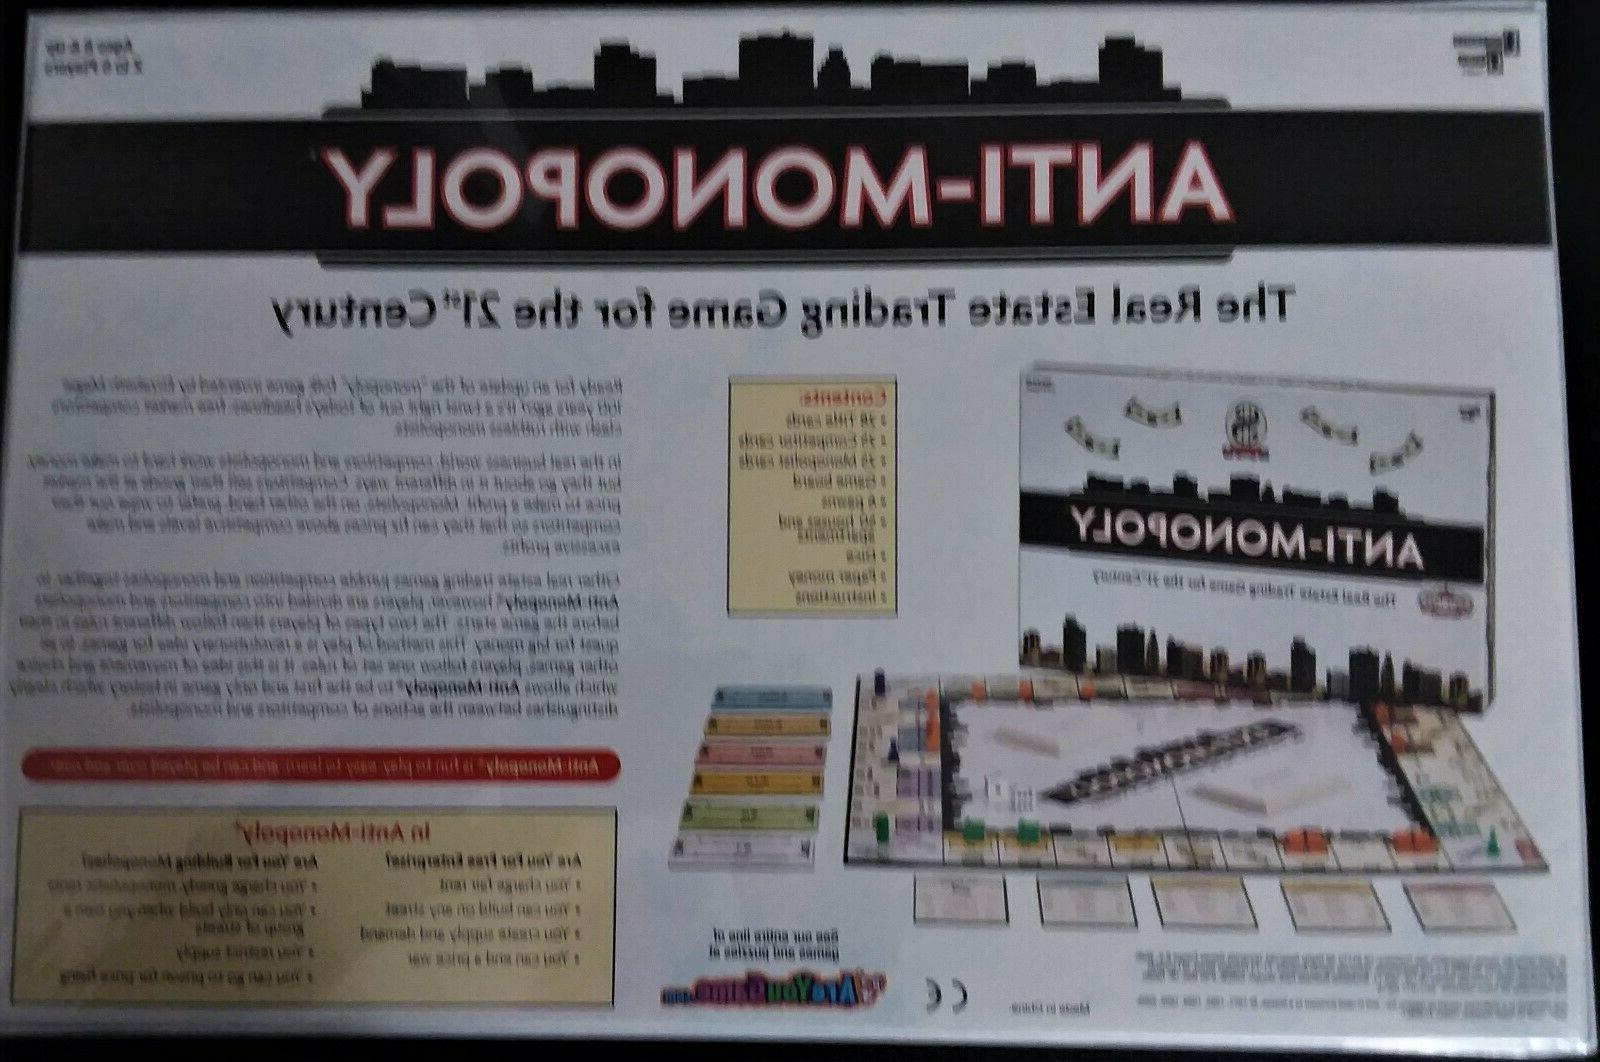 Anti-Monopoly By University New